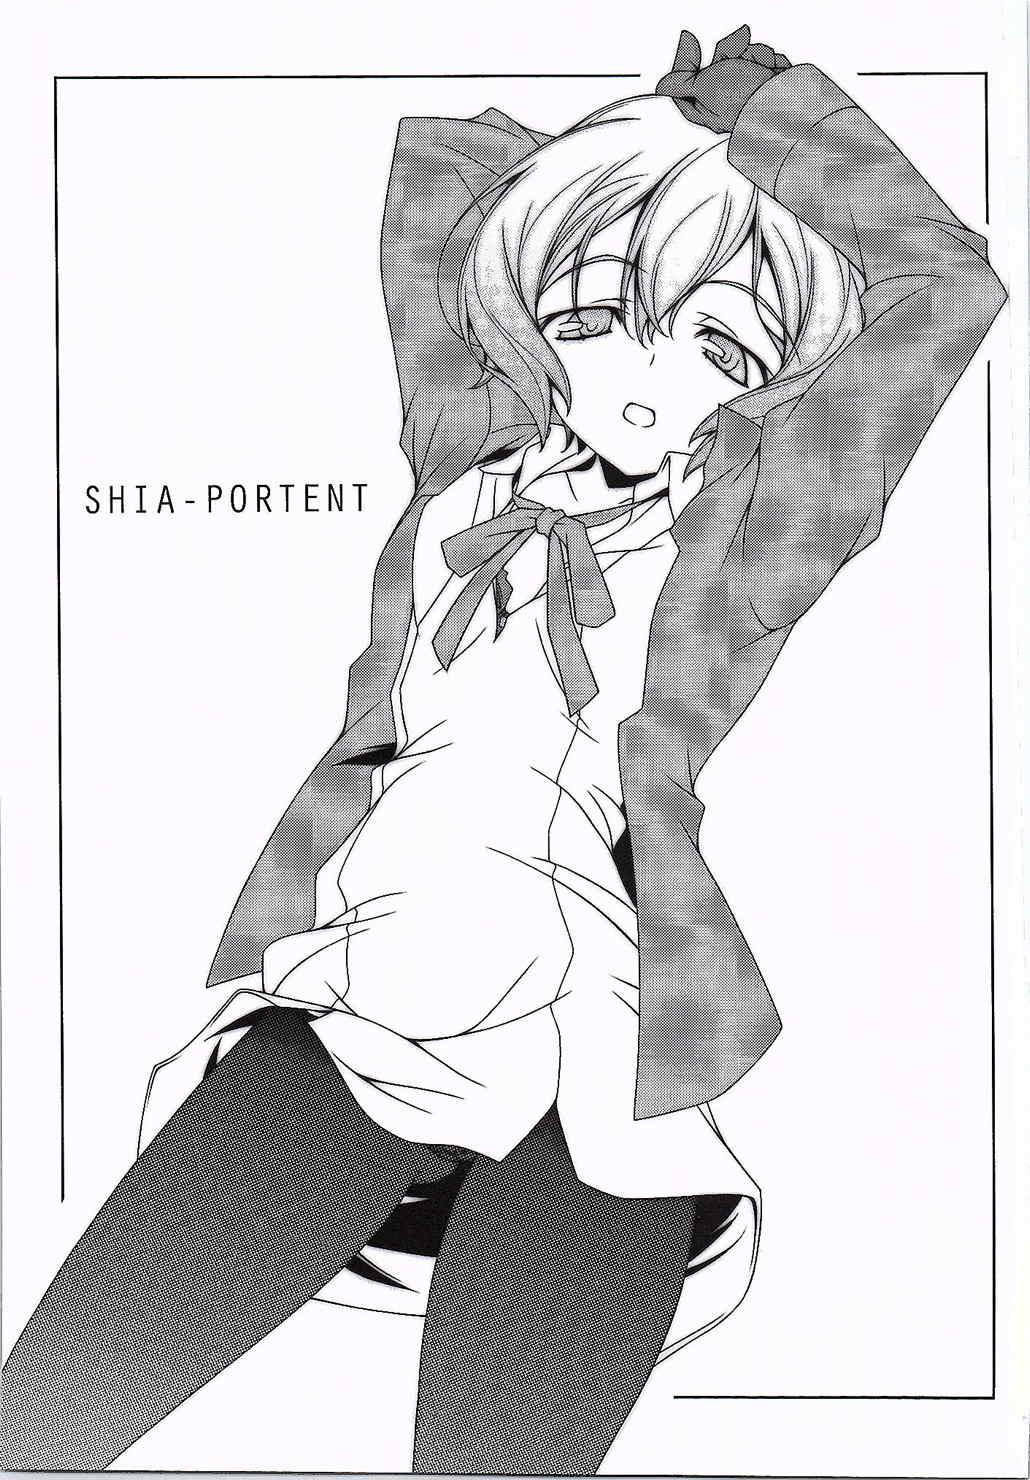 SHIA-PORTENT! 1